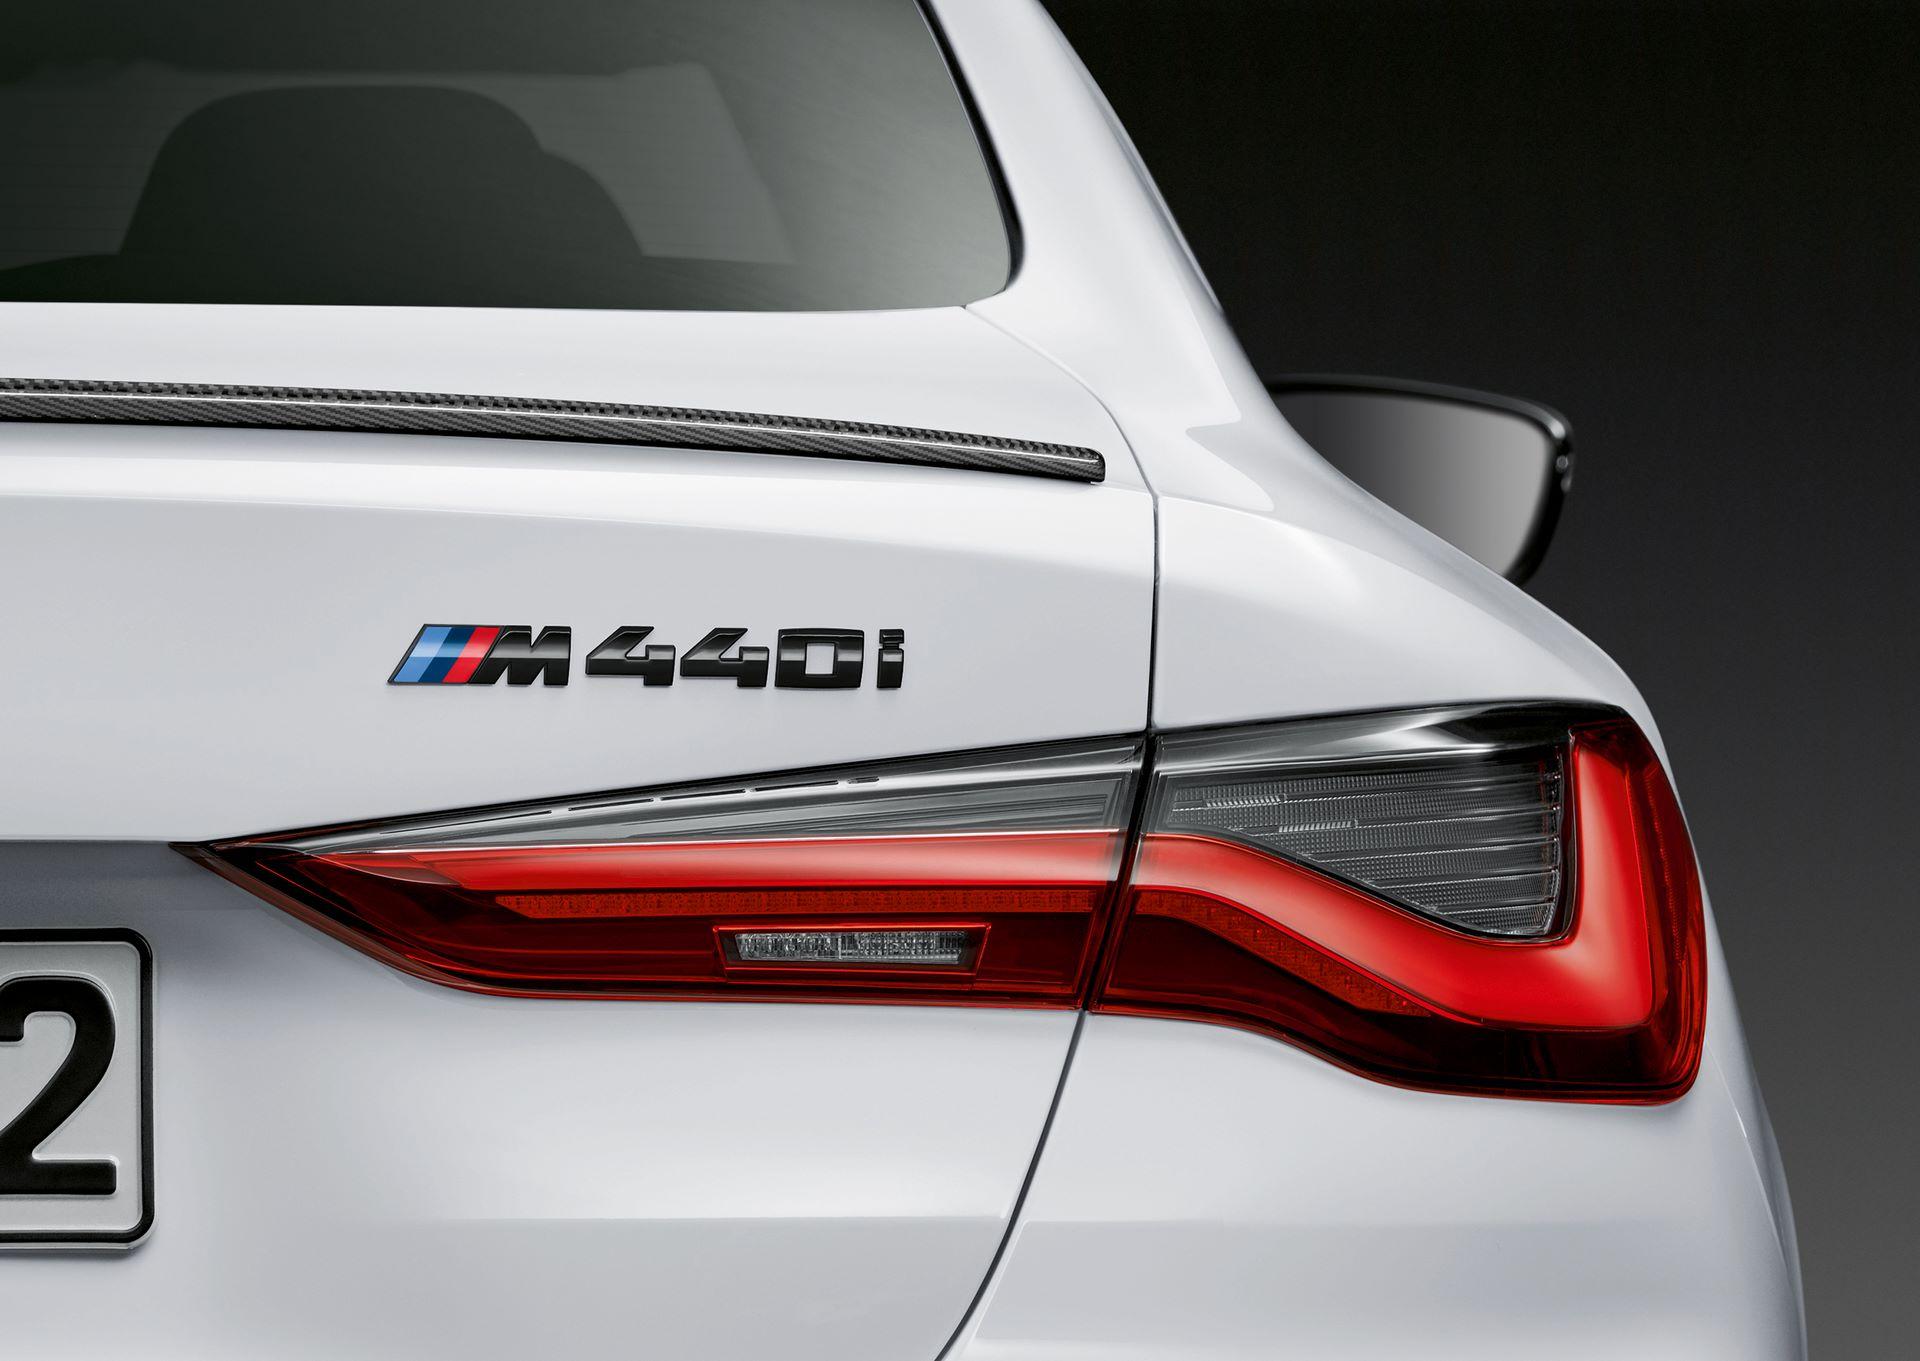 BMW-4-Series-2020-163